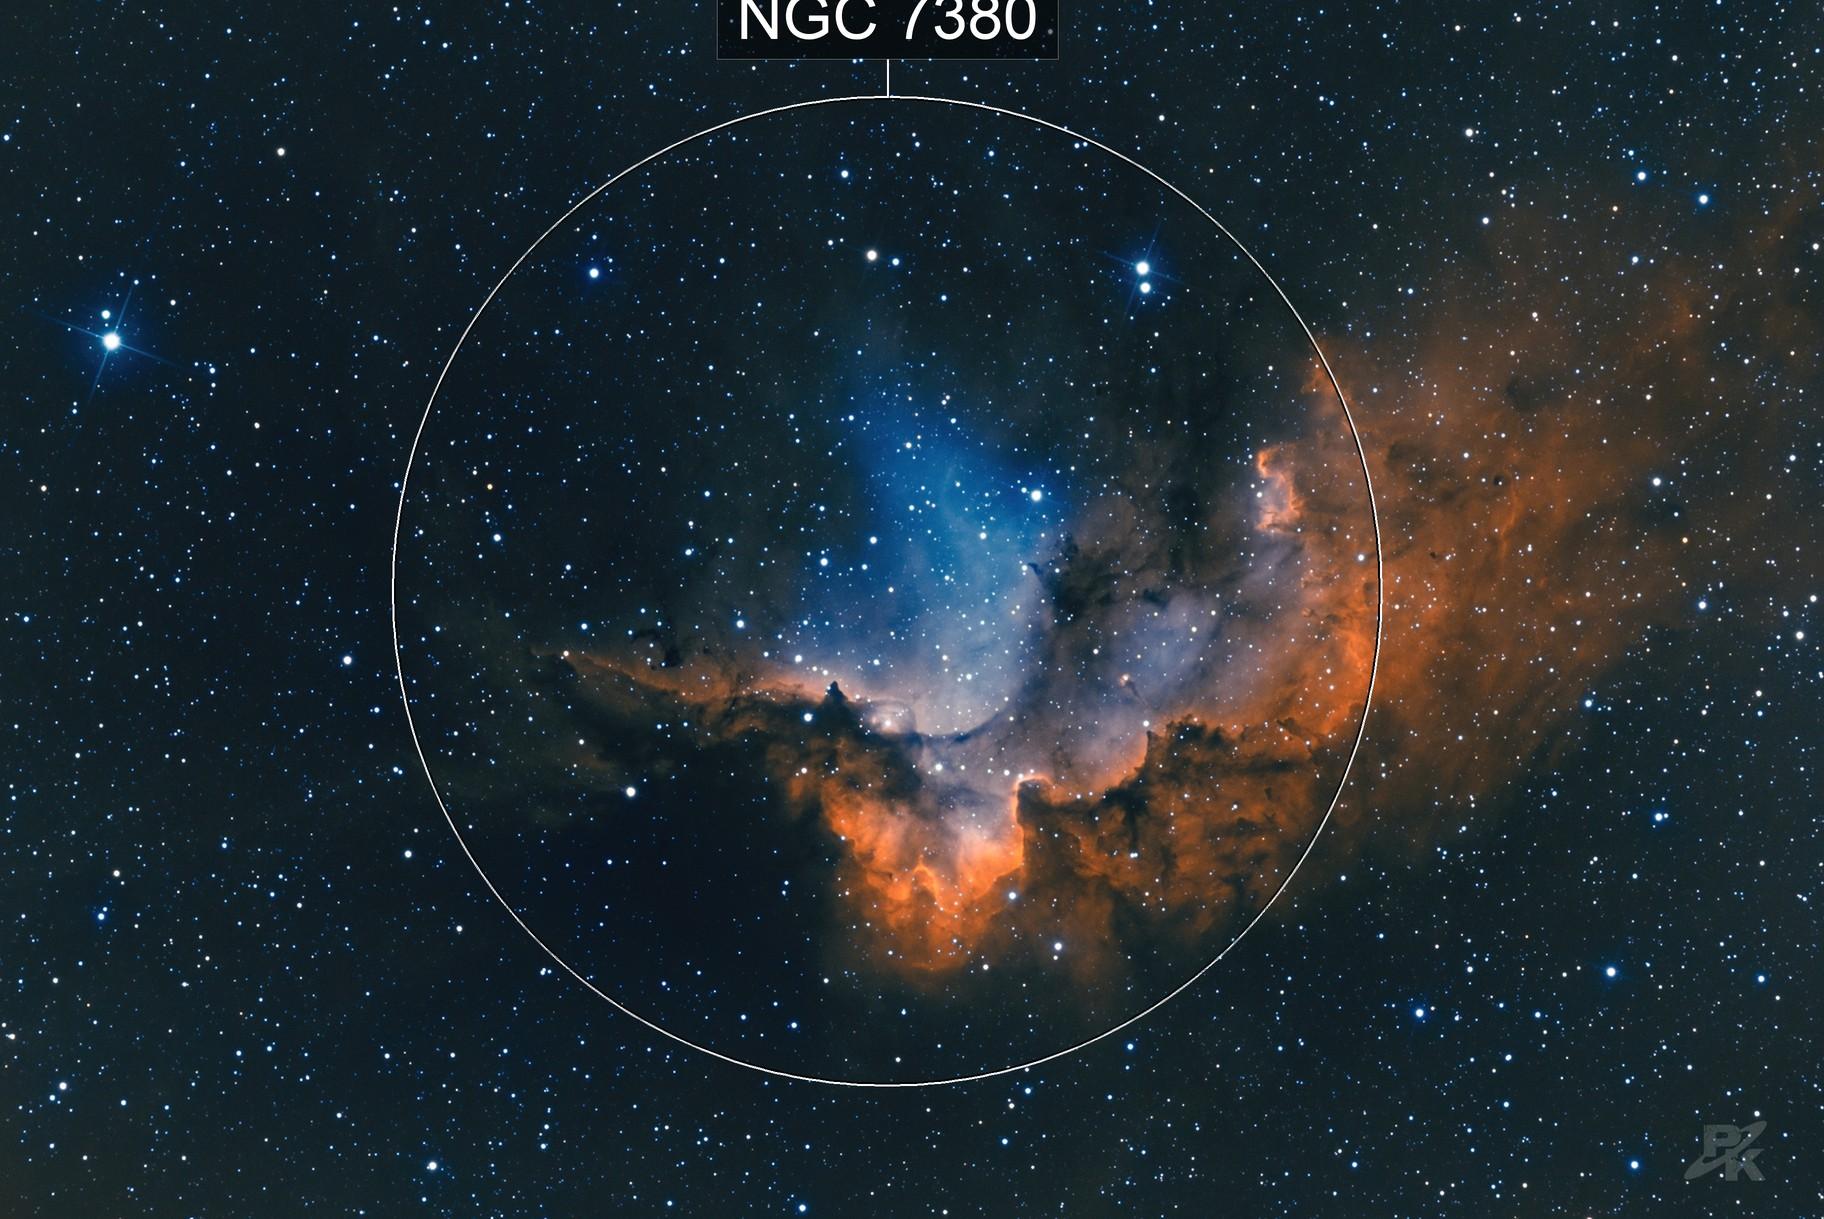 Wizard nebula - NGC 7380